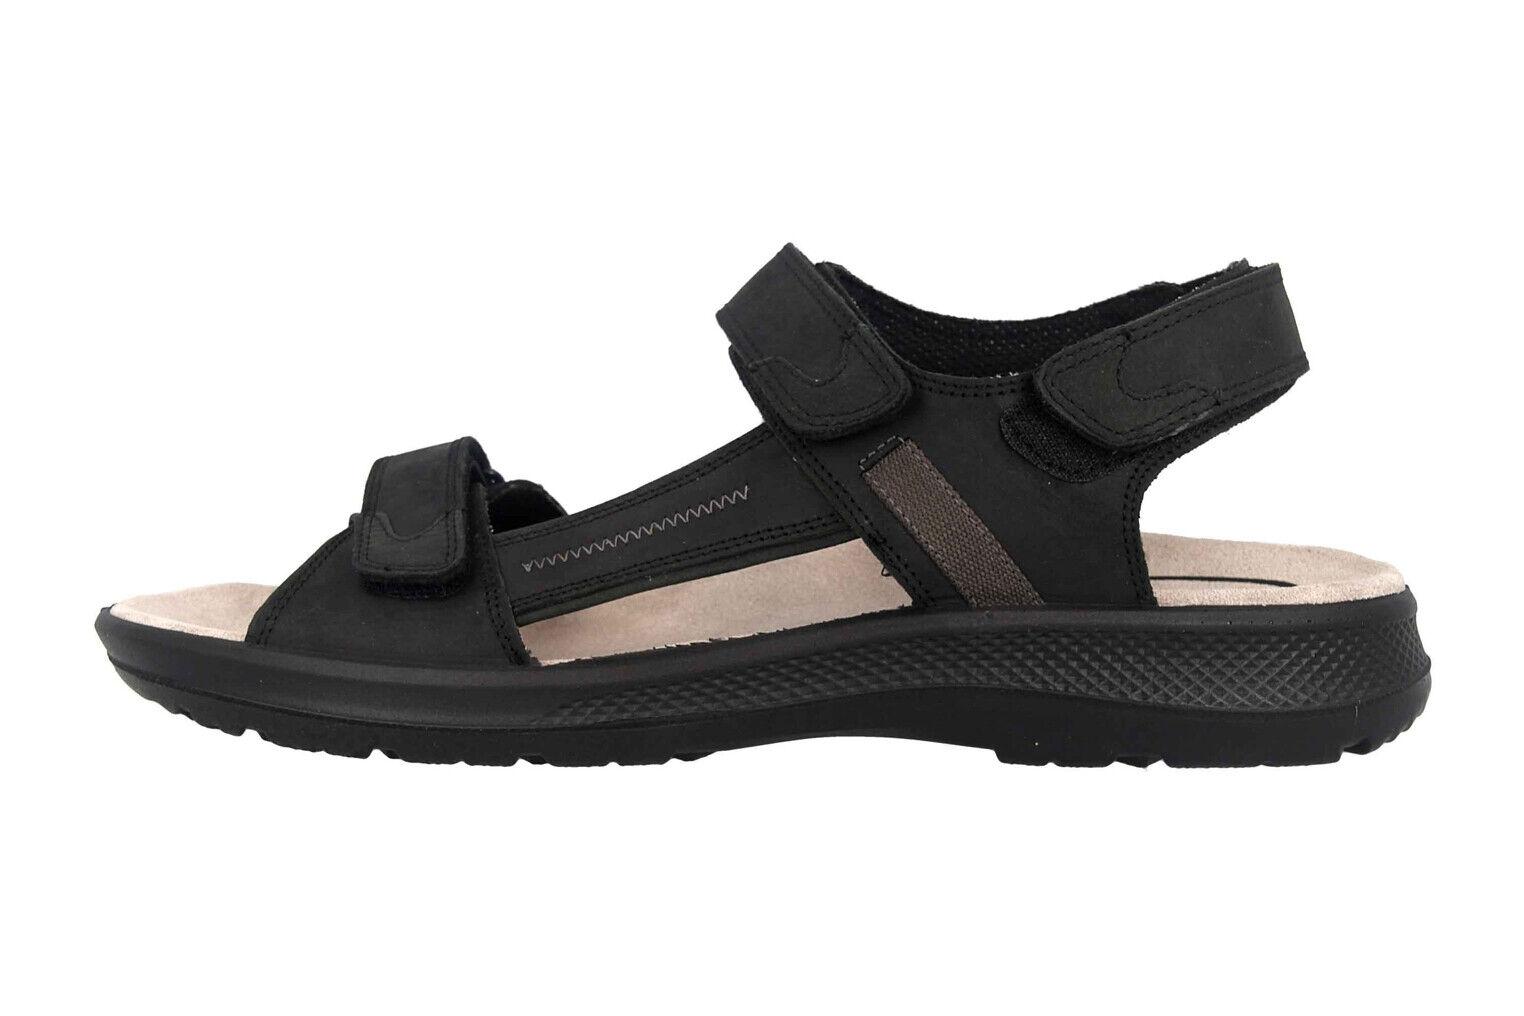 Jomos sandalias en talla extragrande negro 506605 166 0044 grandes zapatos caballero